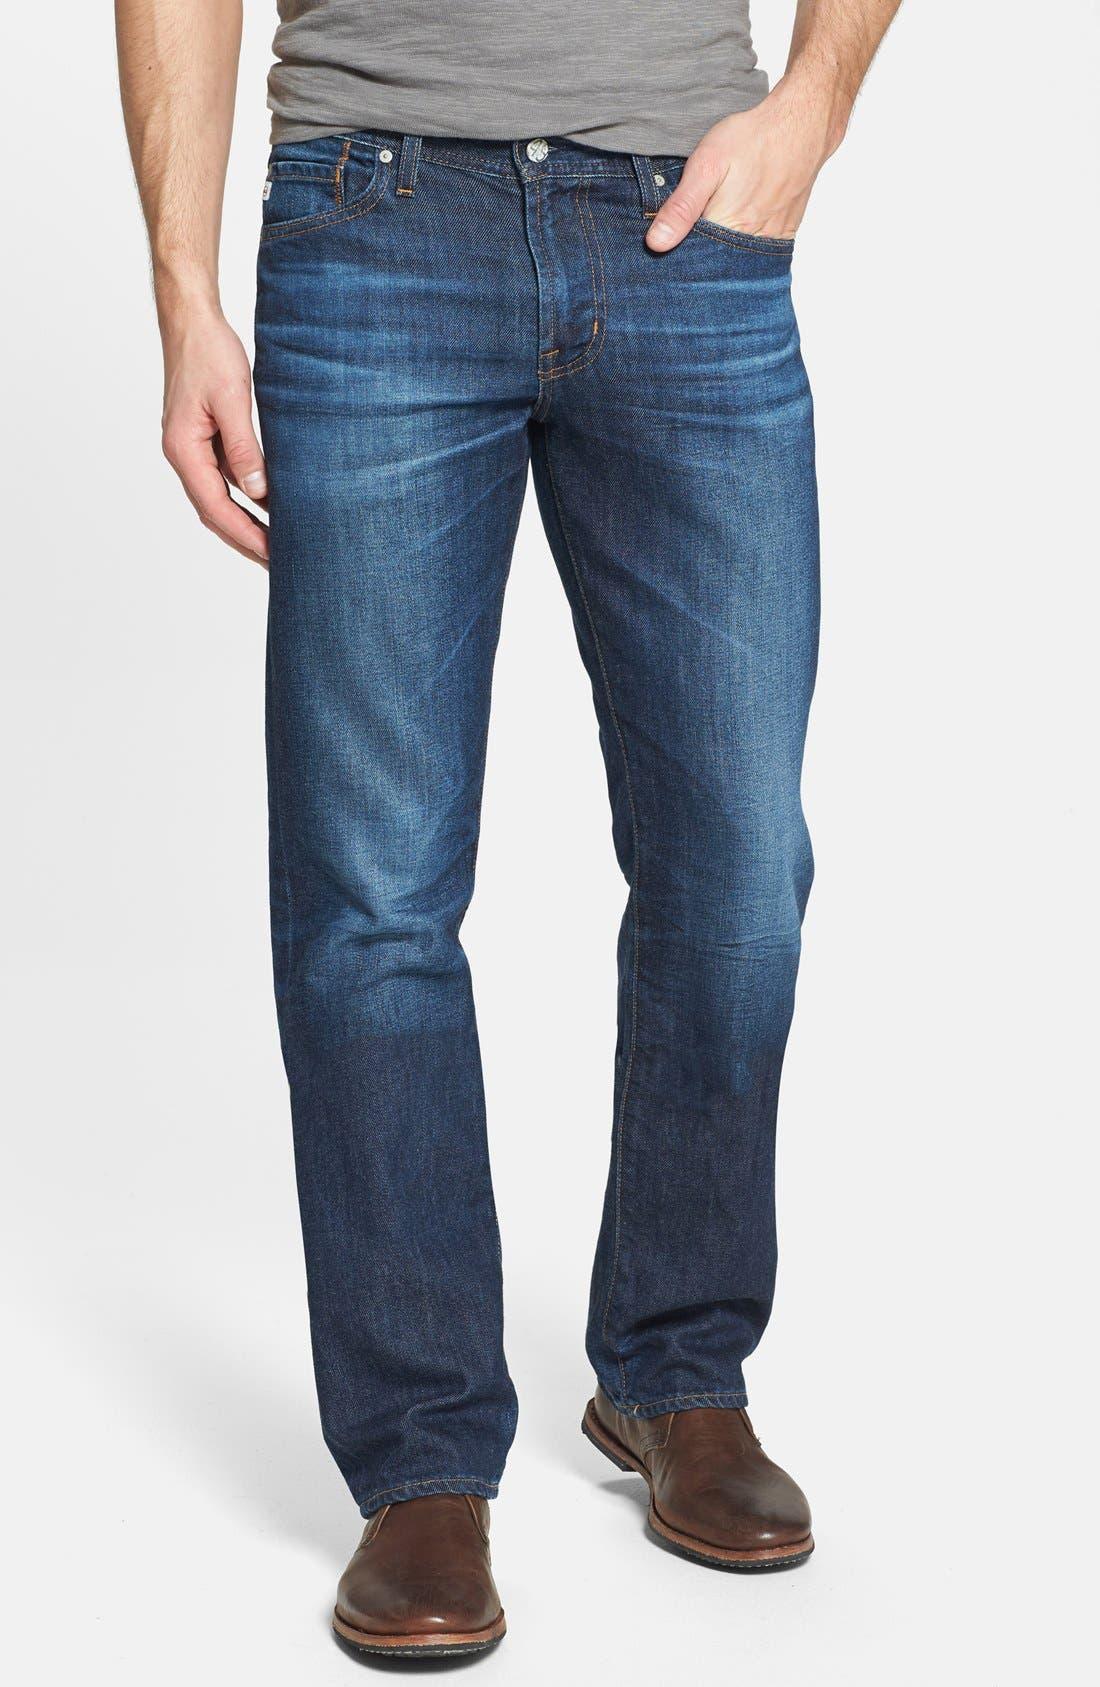 Alternate Image 1 Selected - AG 'Protégé' Straight Leg Jeans (8 Year Gust)